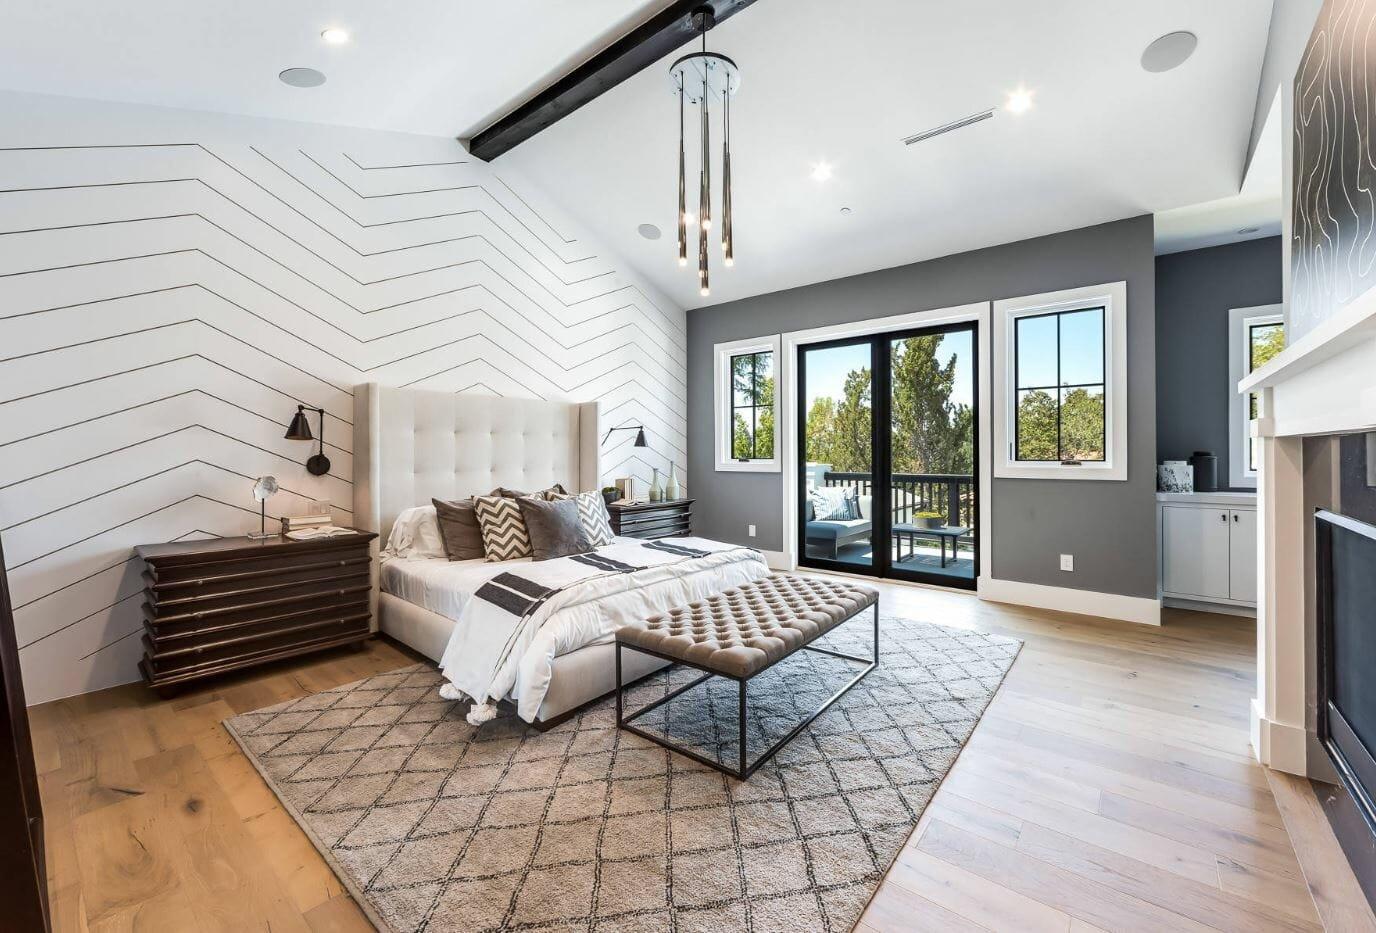 bedroom interior design feature